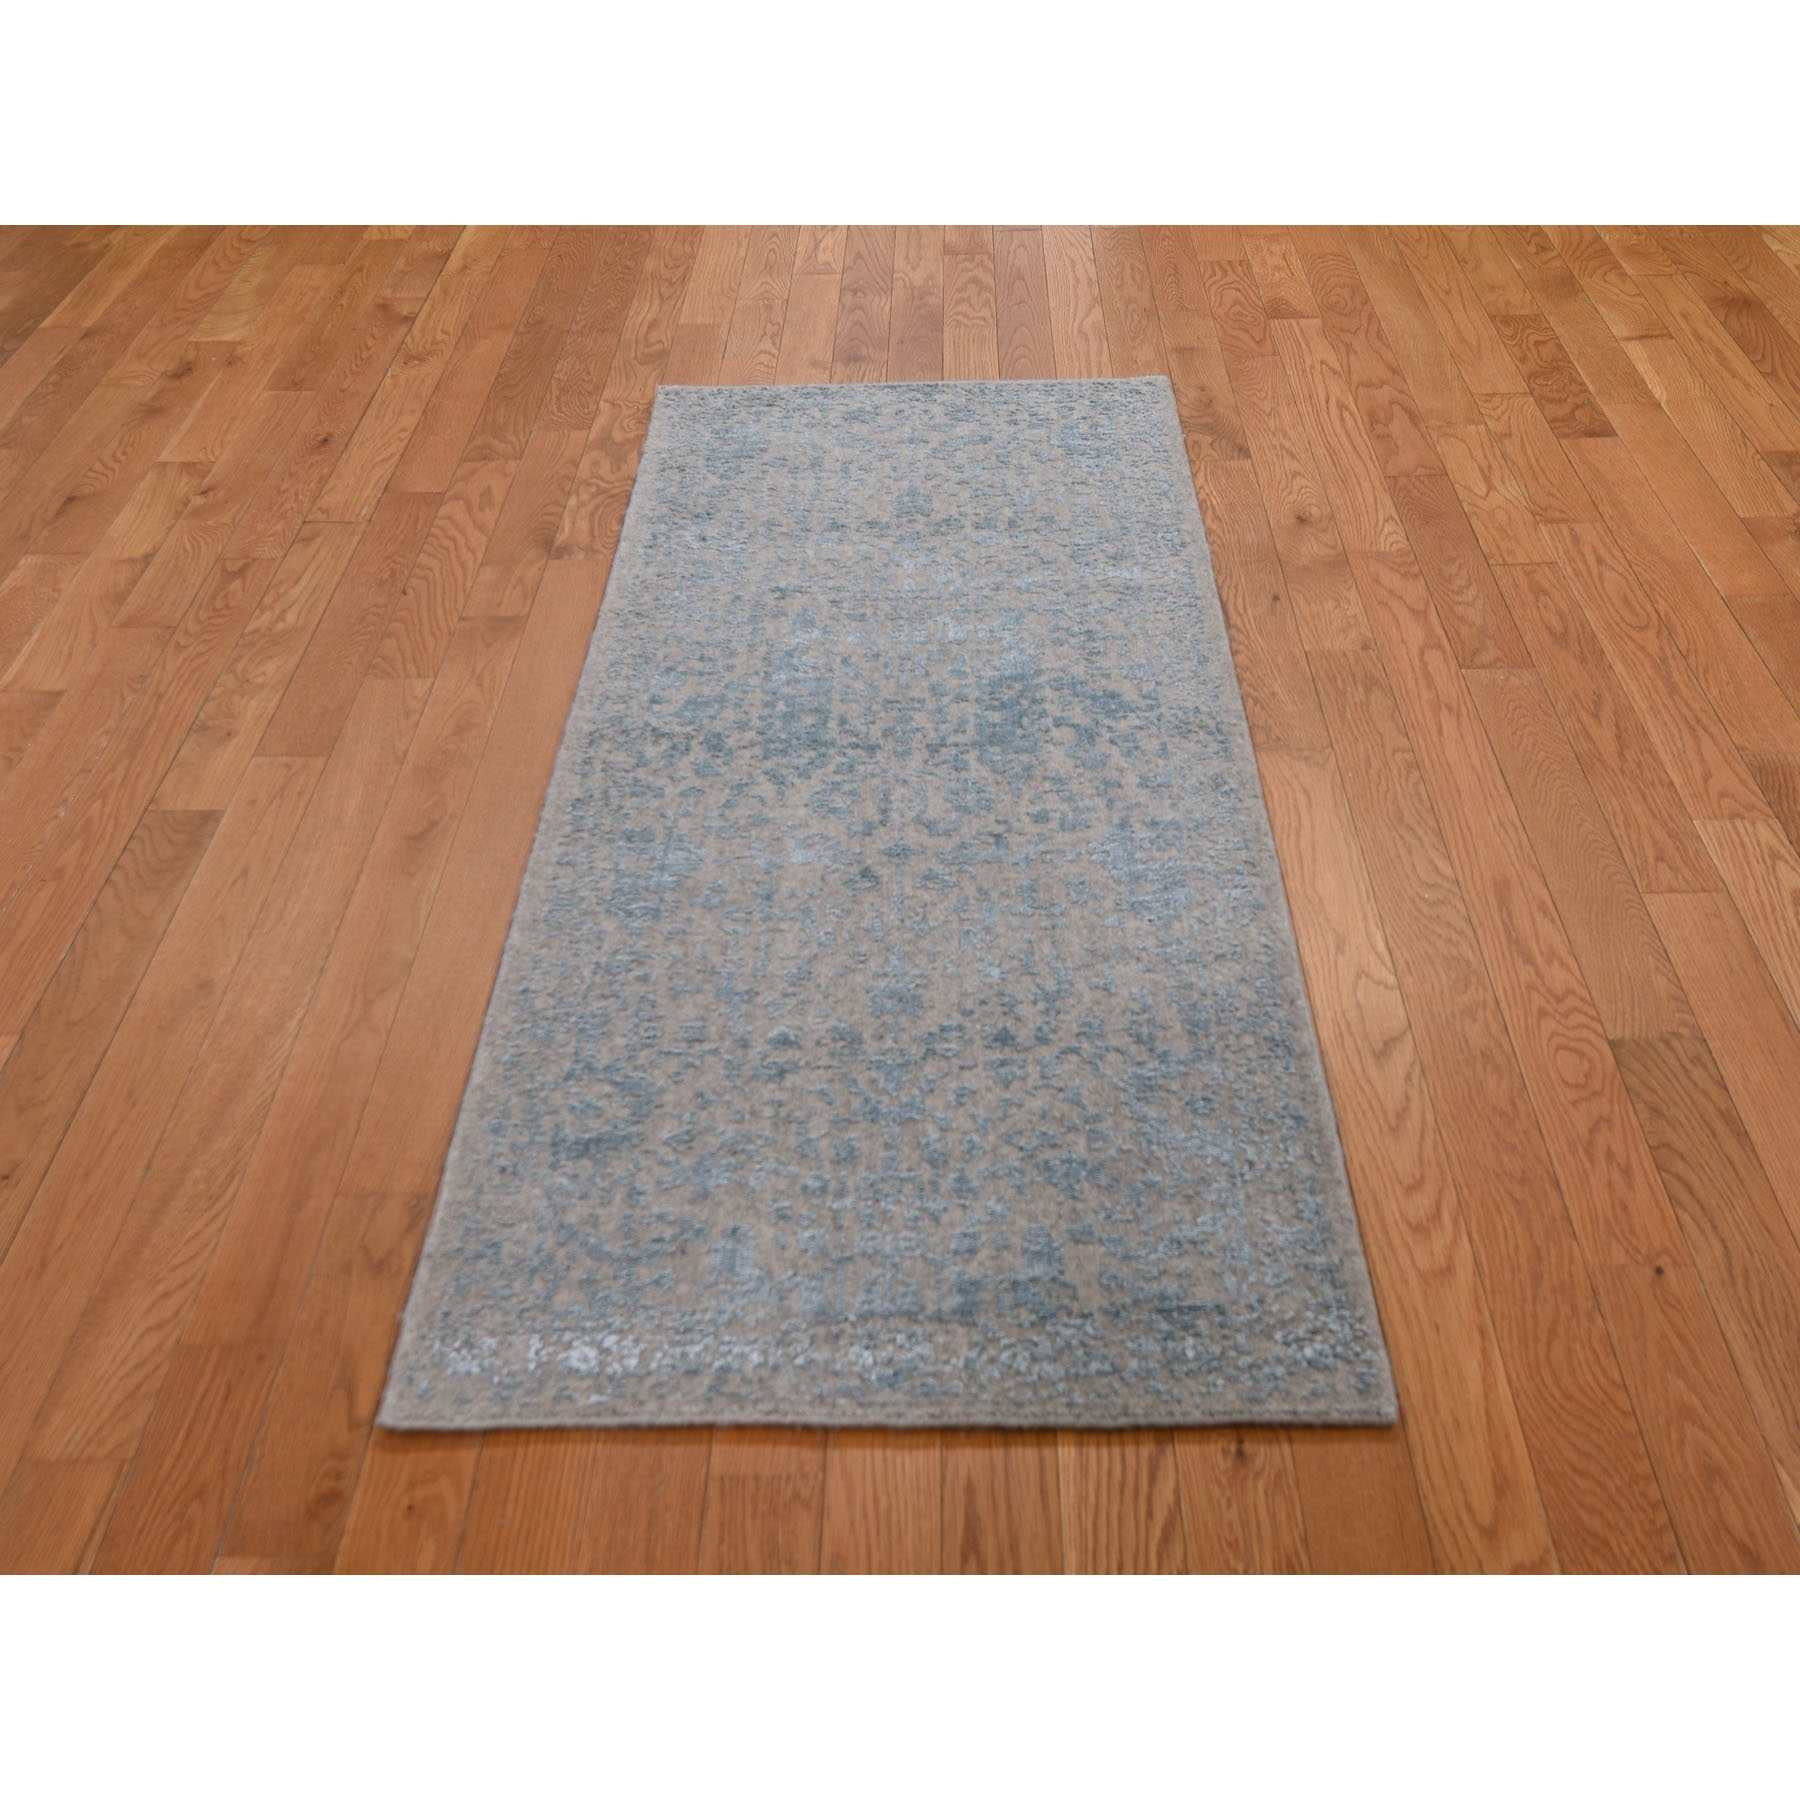 2-5 x6- Gray Jacquard Hand Loomed Wool And Art Silk Heriz Design Runner Oriental Rug